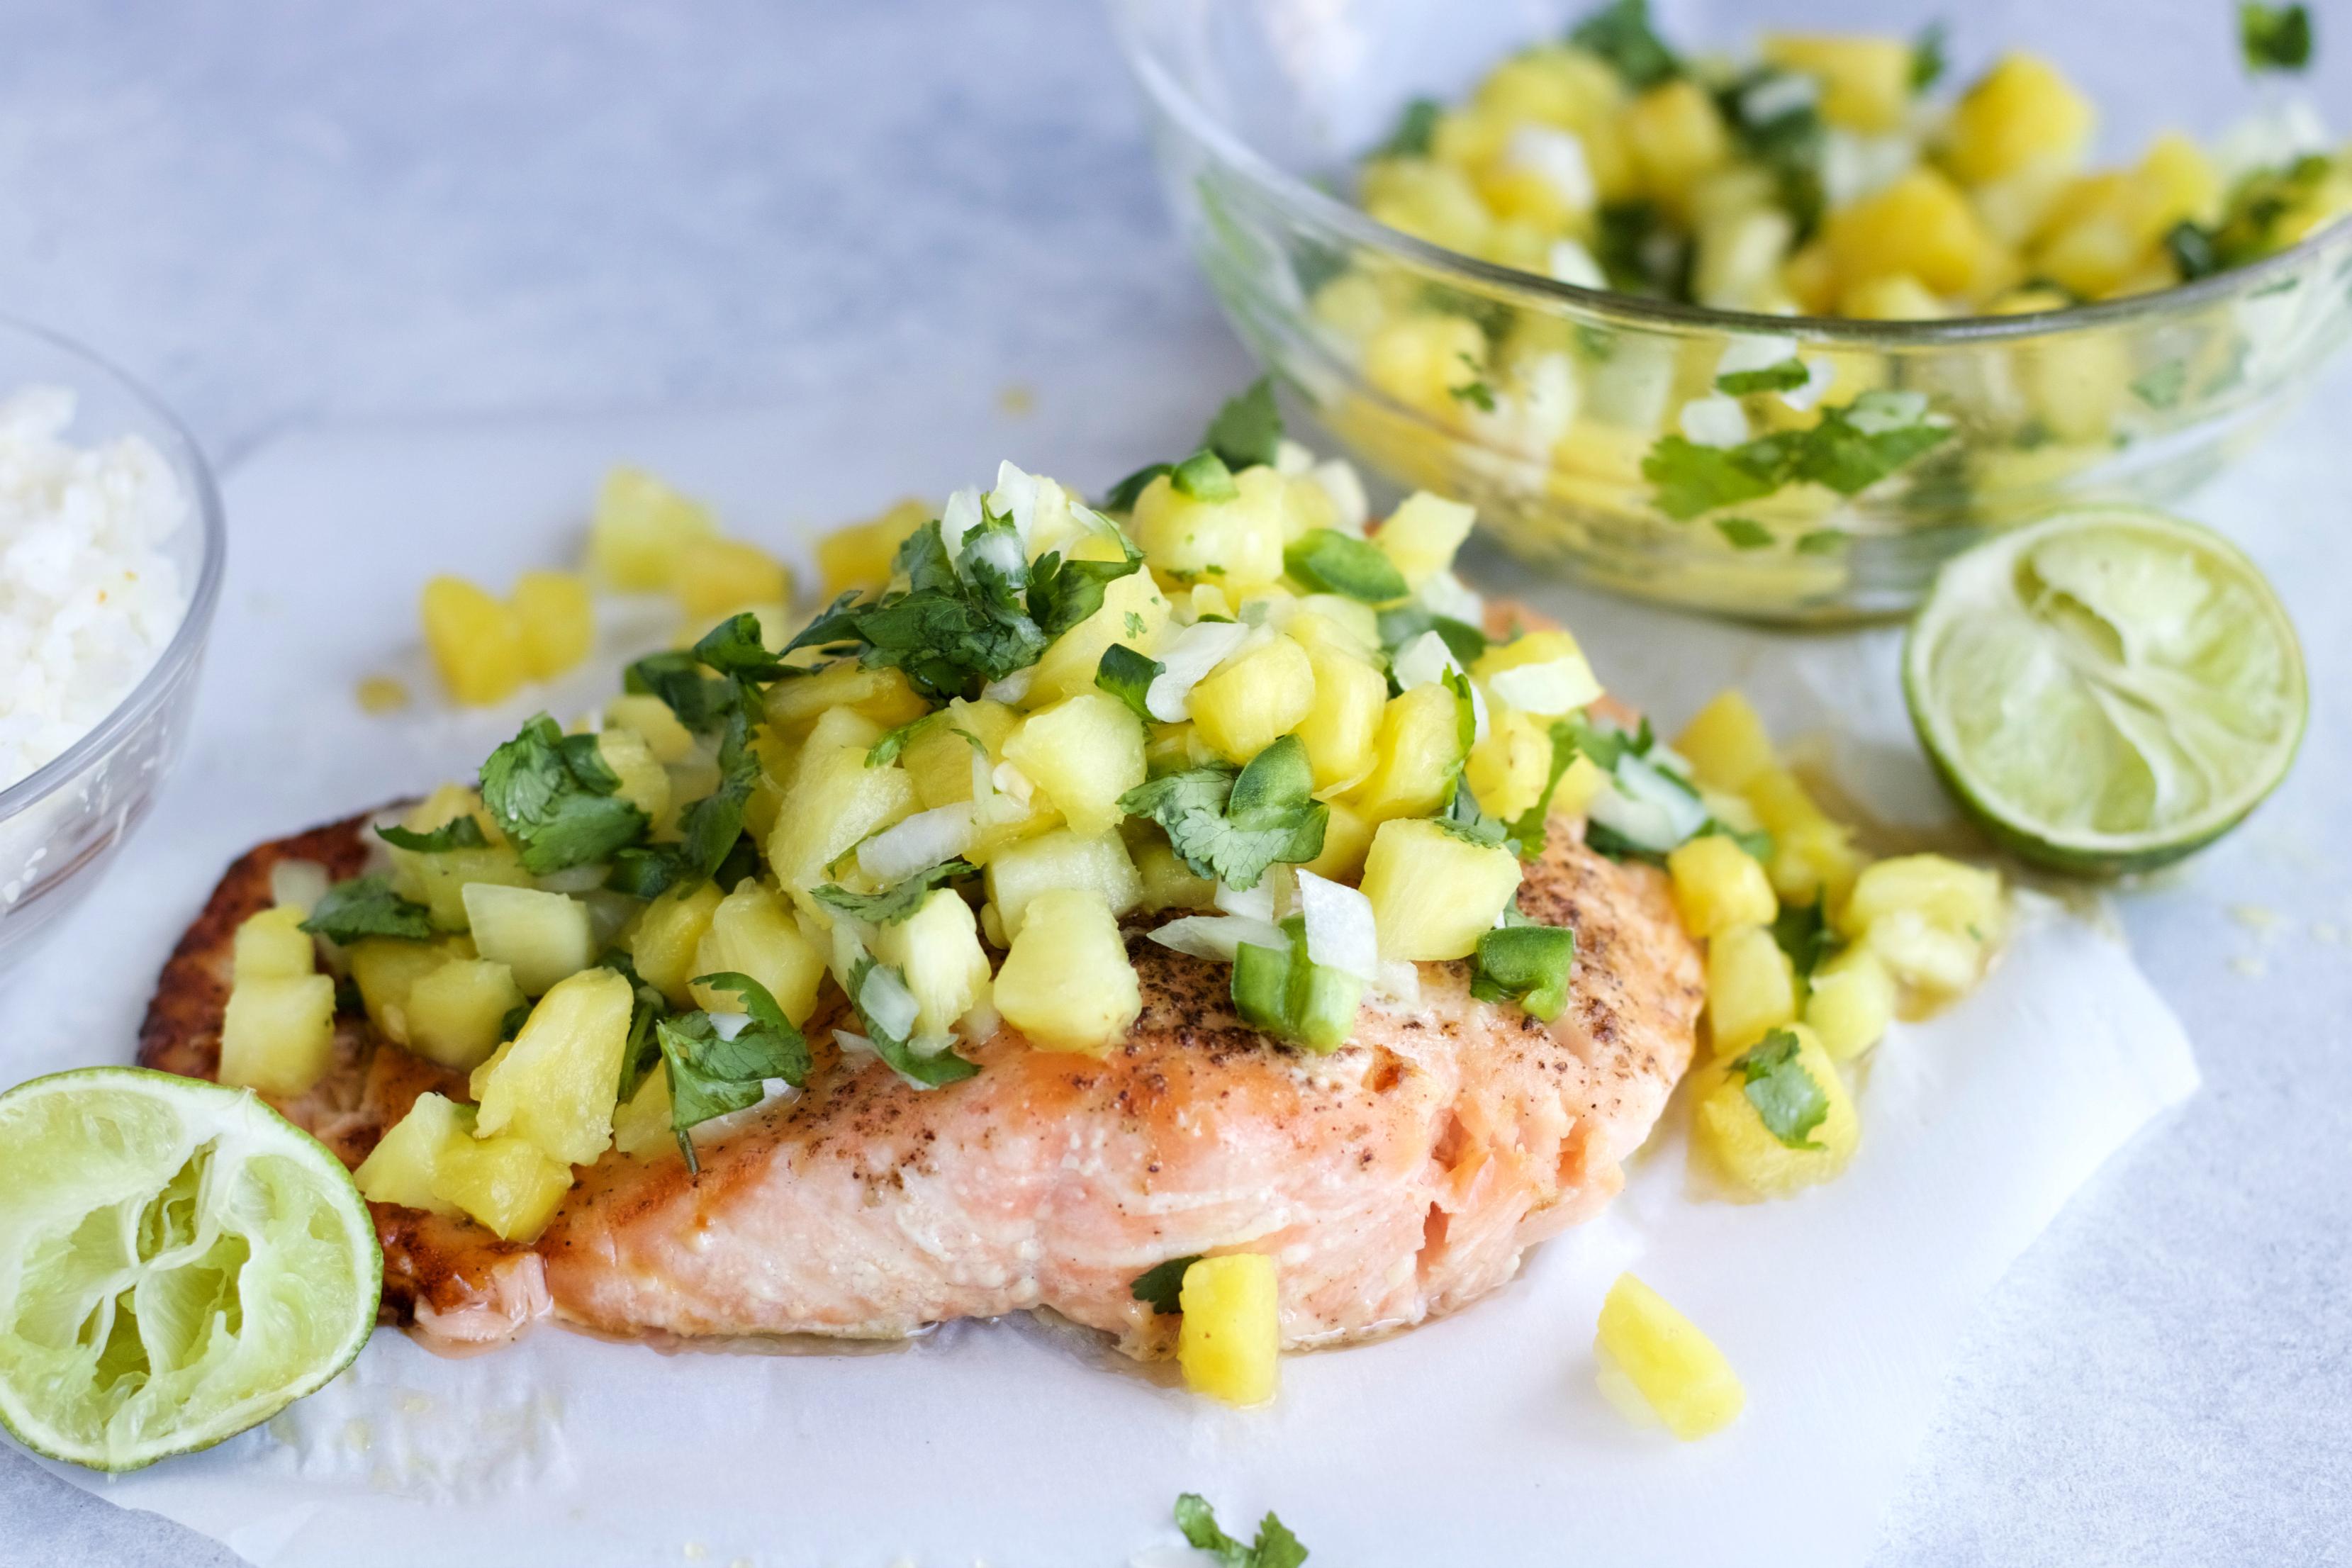 Grilled Salmon With Pineapple Jalapeño Salsa